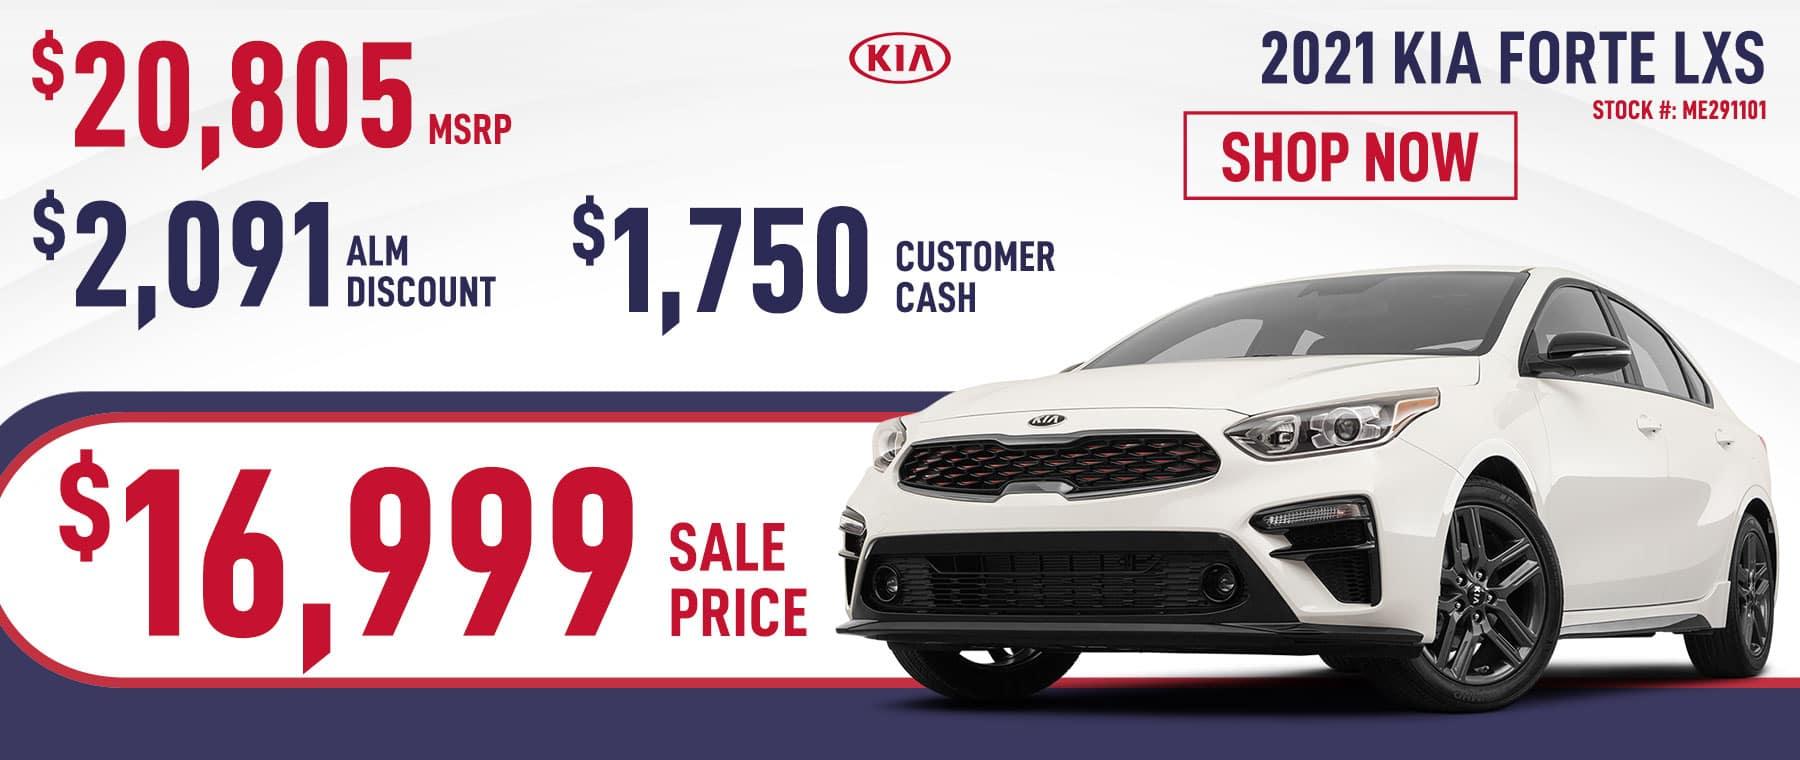 2021 Kia Forte LXS Sale Price $16,999